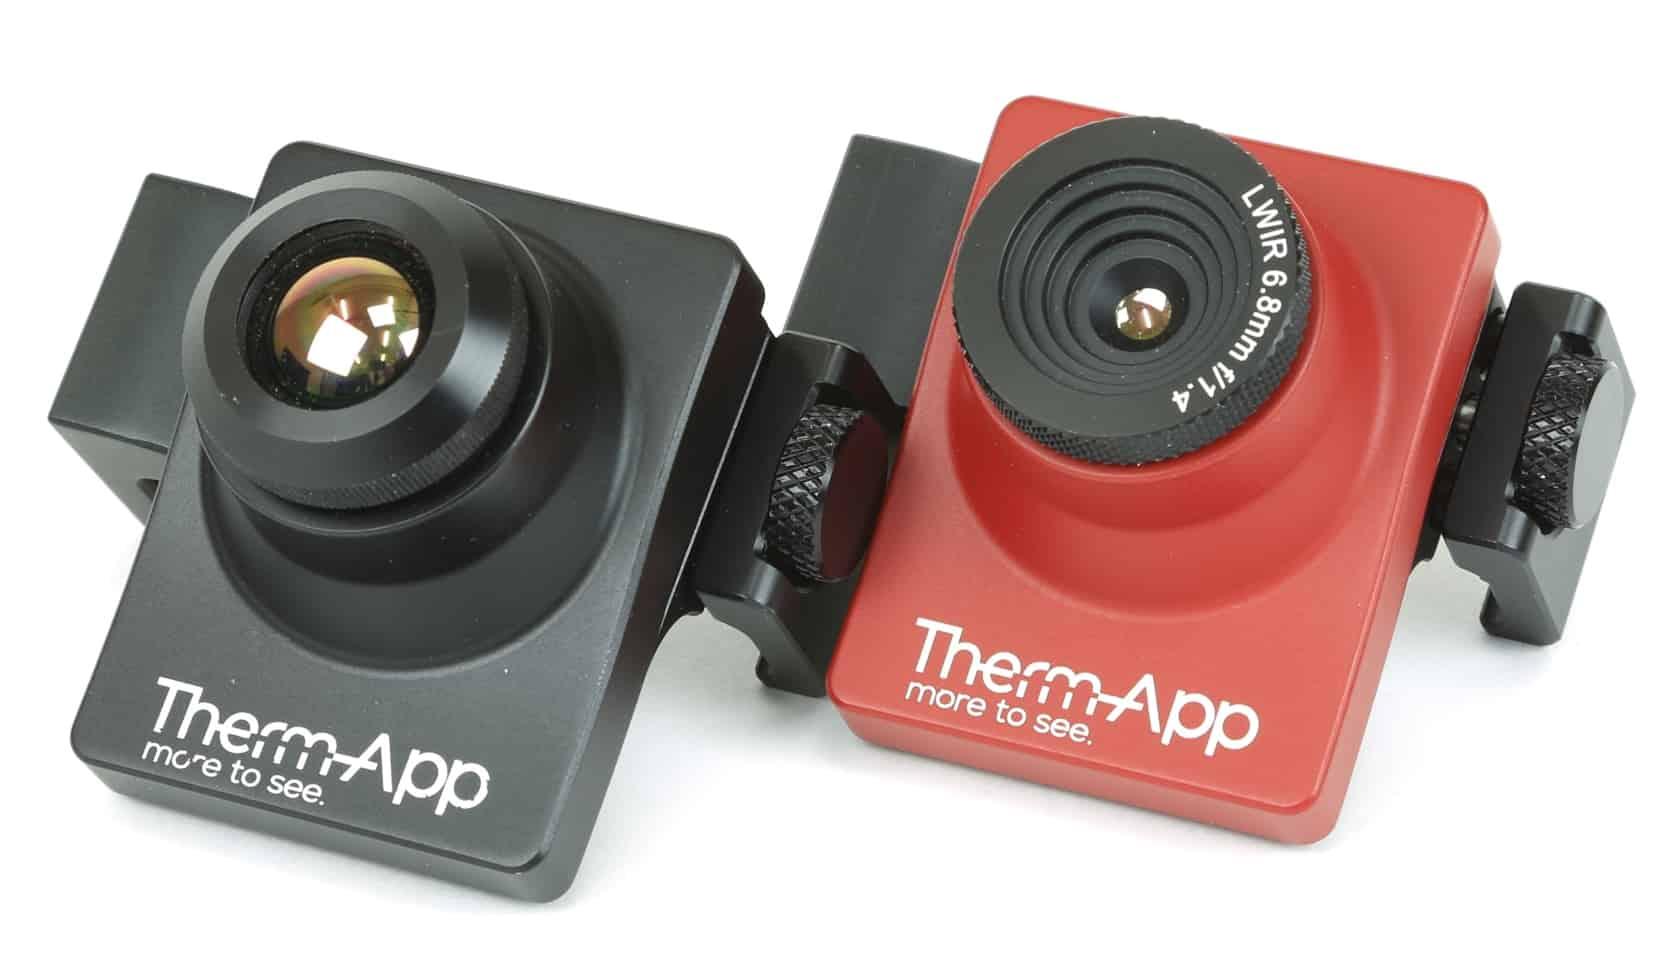 therm app th hochaufl sende infrarot w rmebildkamera f r smartphones avio nec. Black Bedroom Furniture Sets. Home Design Ideas